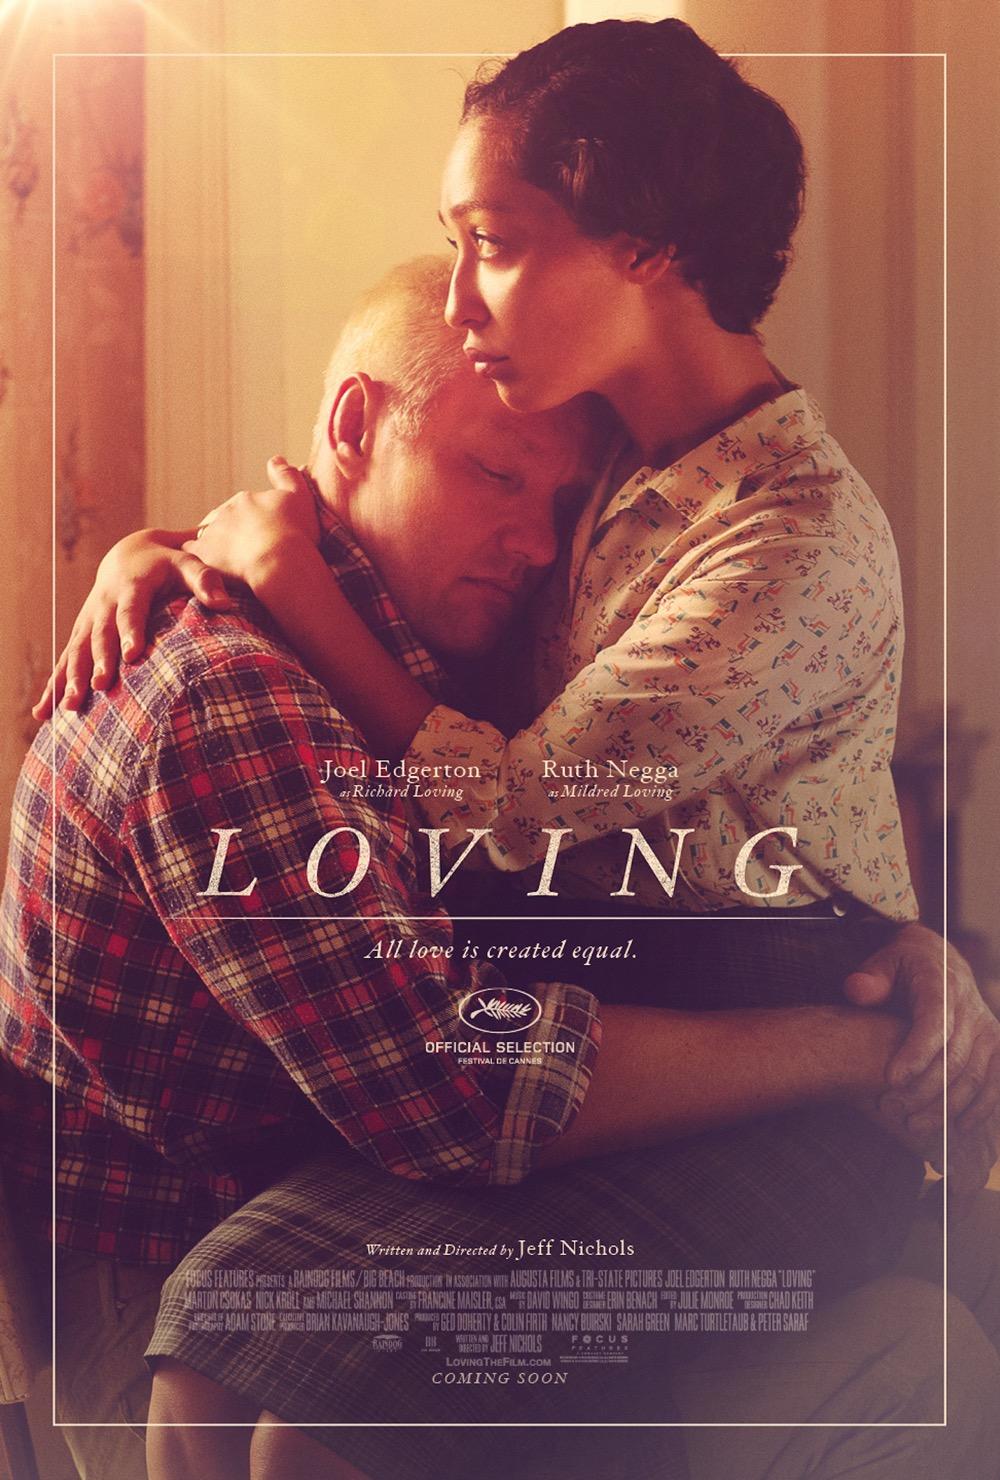 loving-poster-ruth-negga-joel-edgerton.jpg